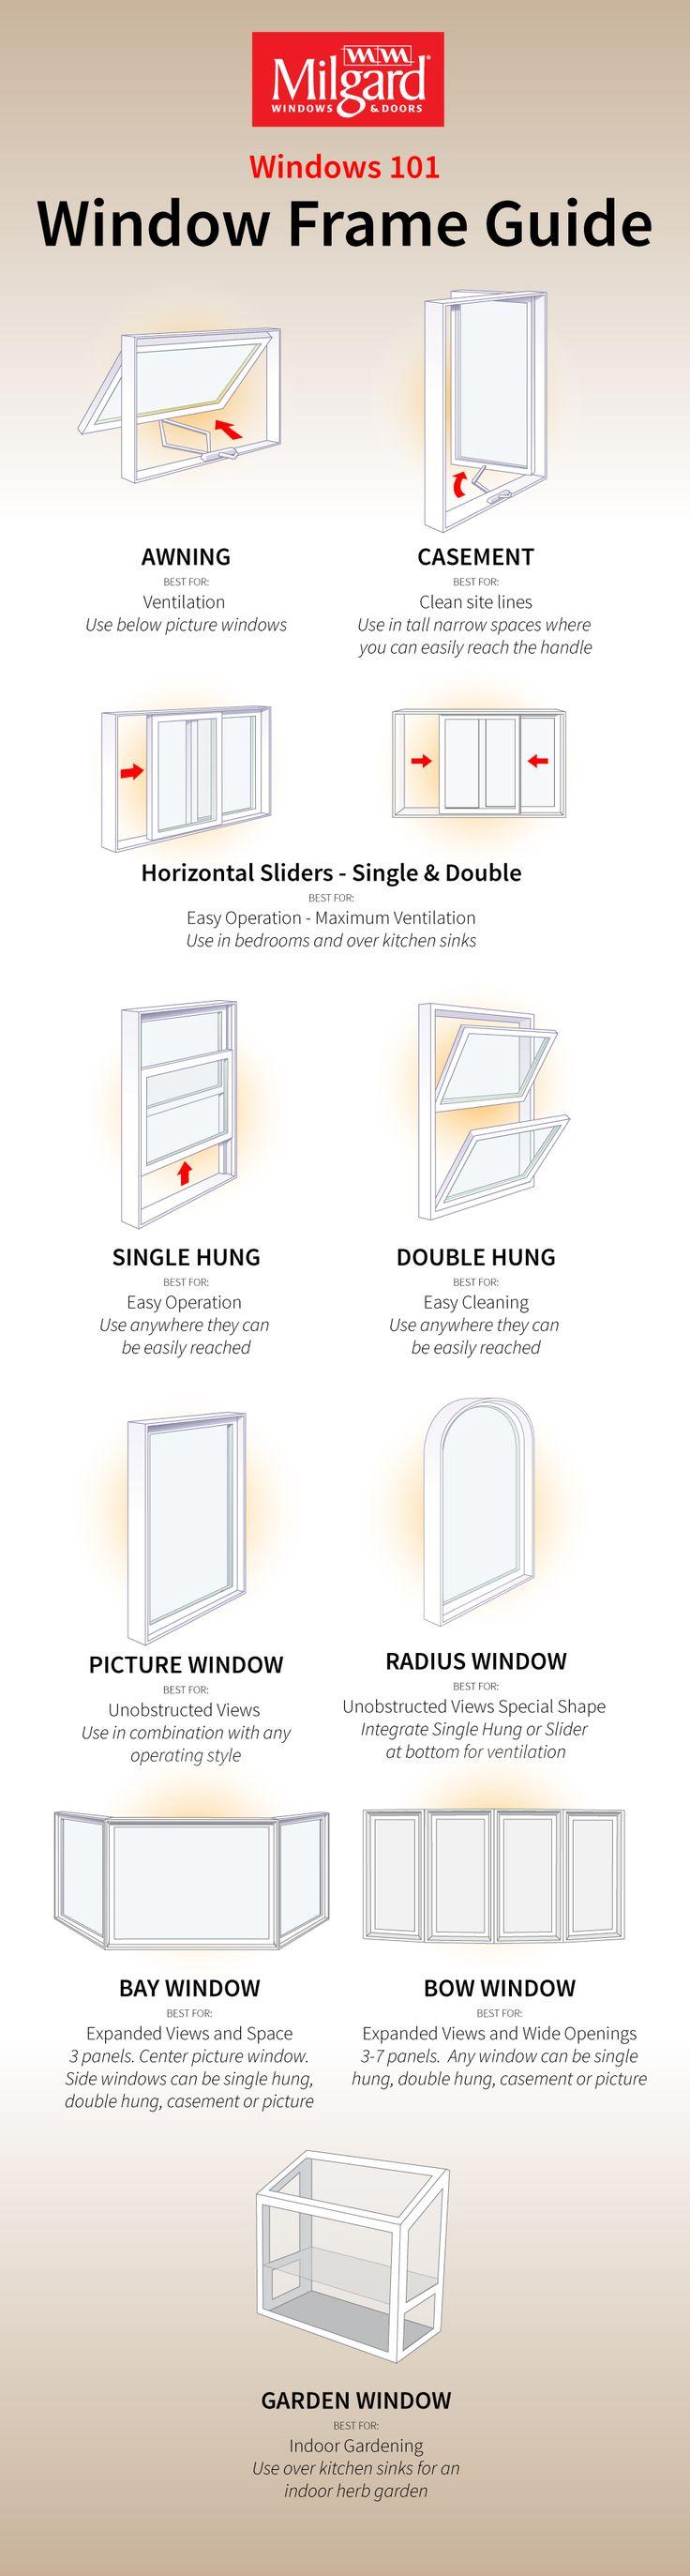 Window frame Guid